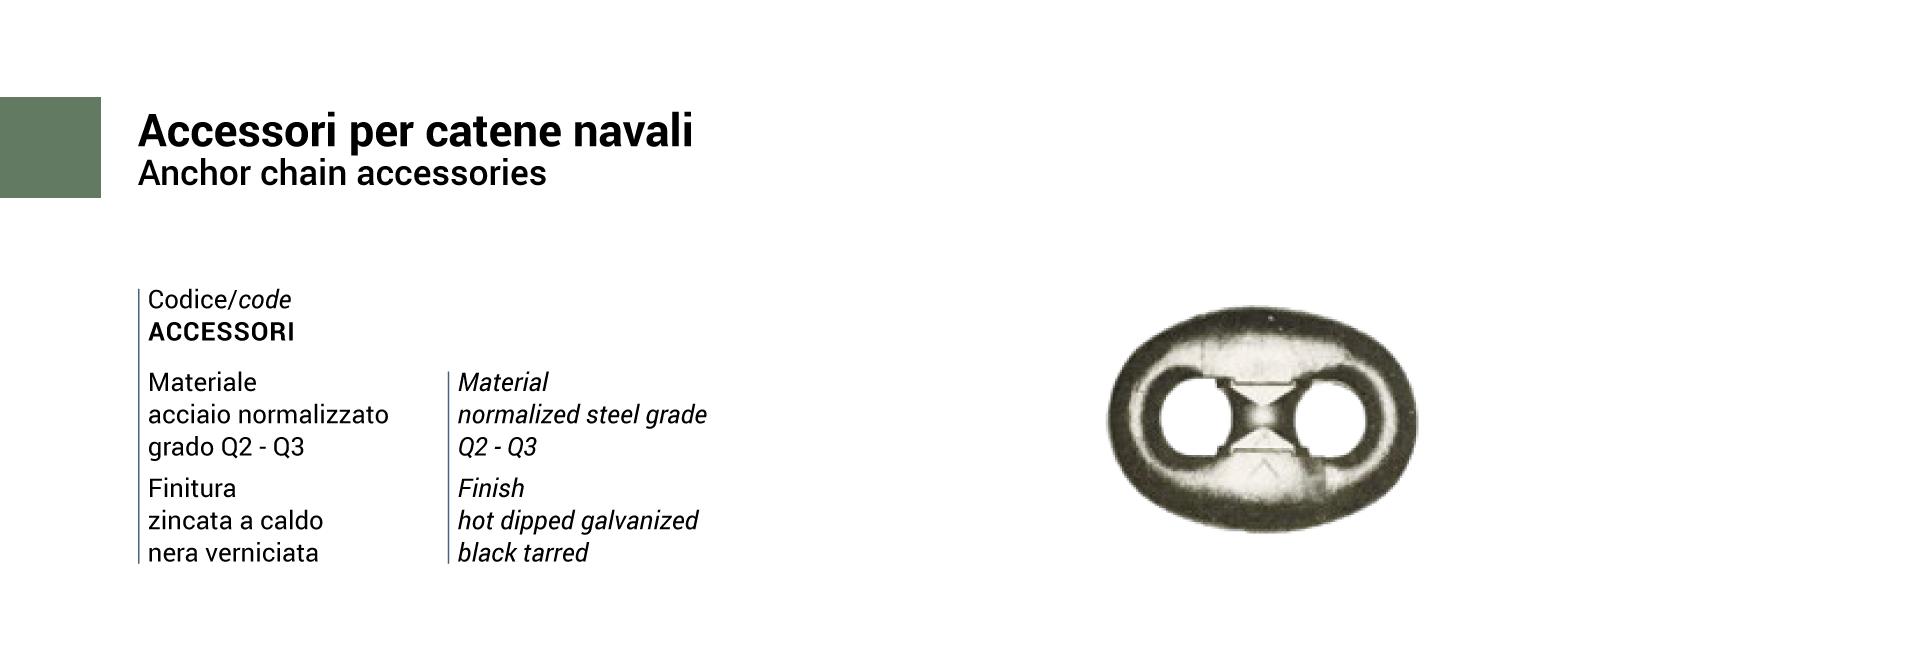 Italmet Accessori per catene navali